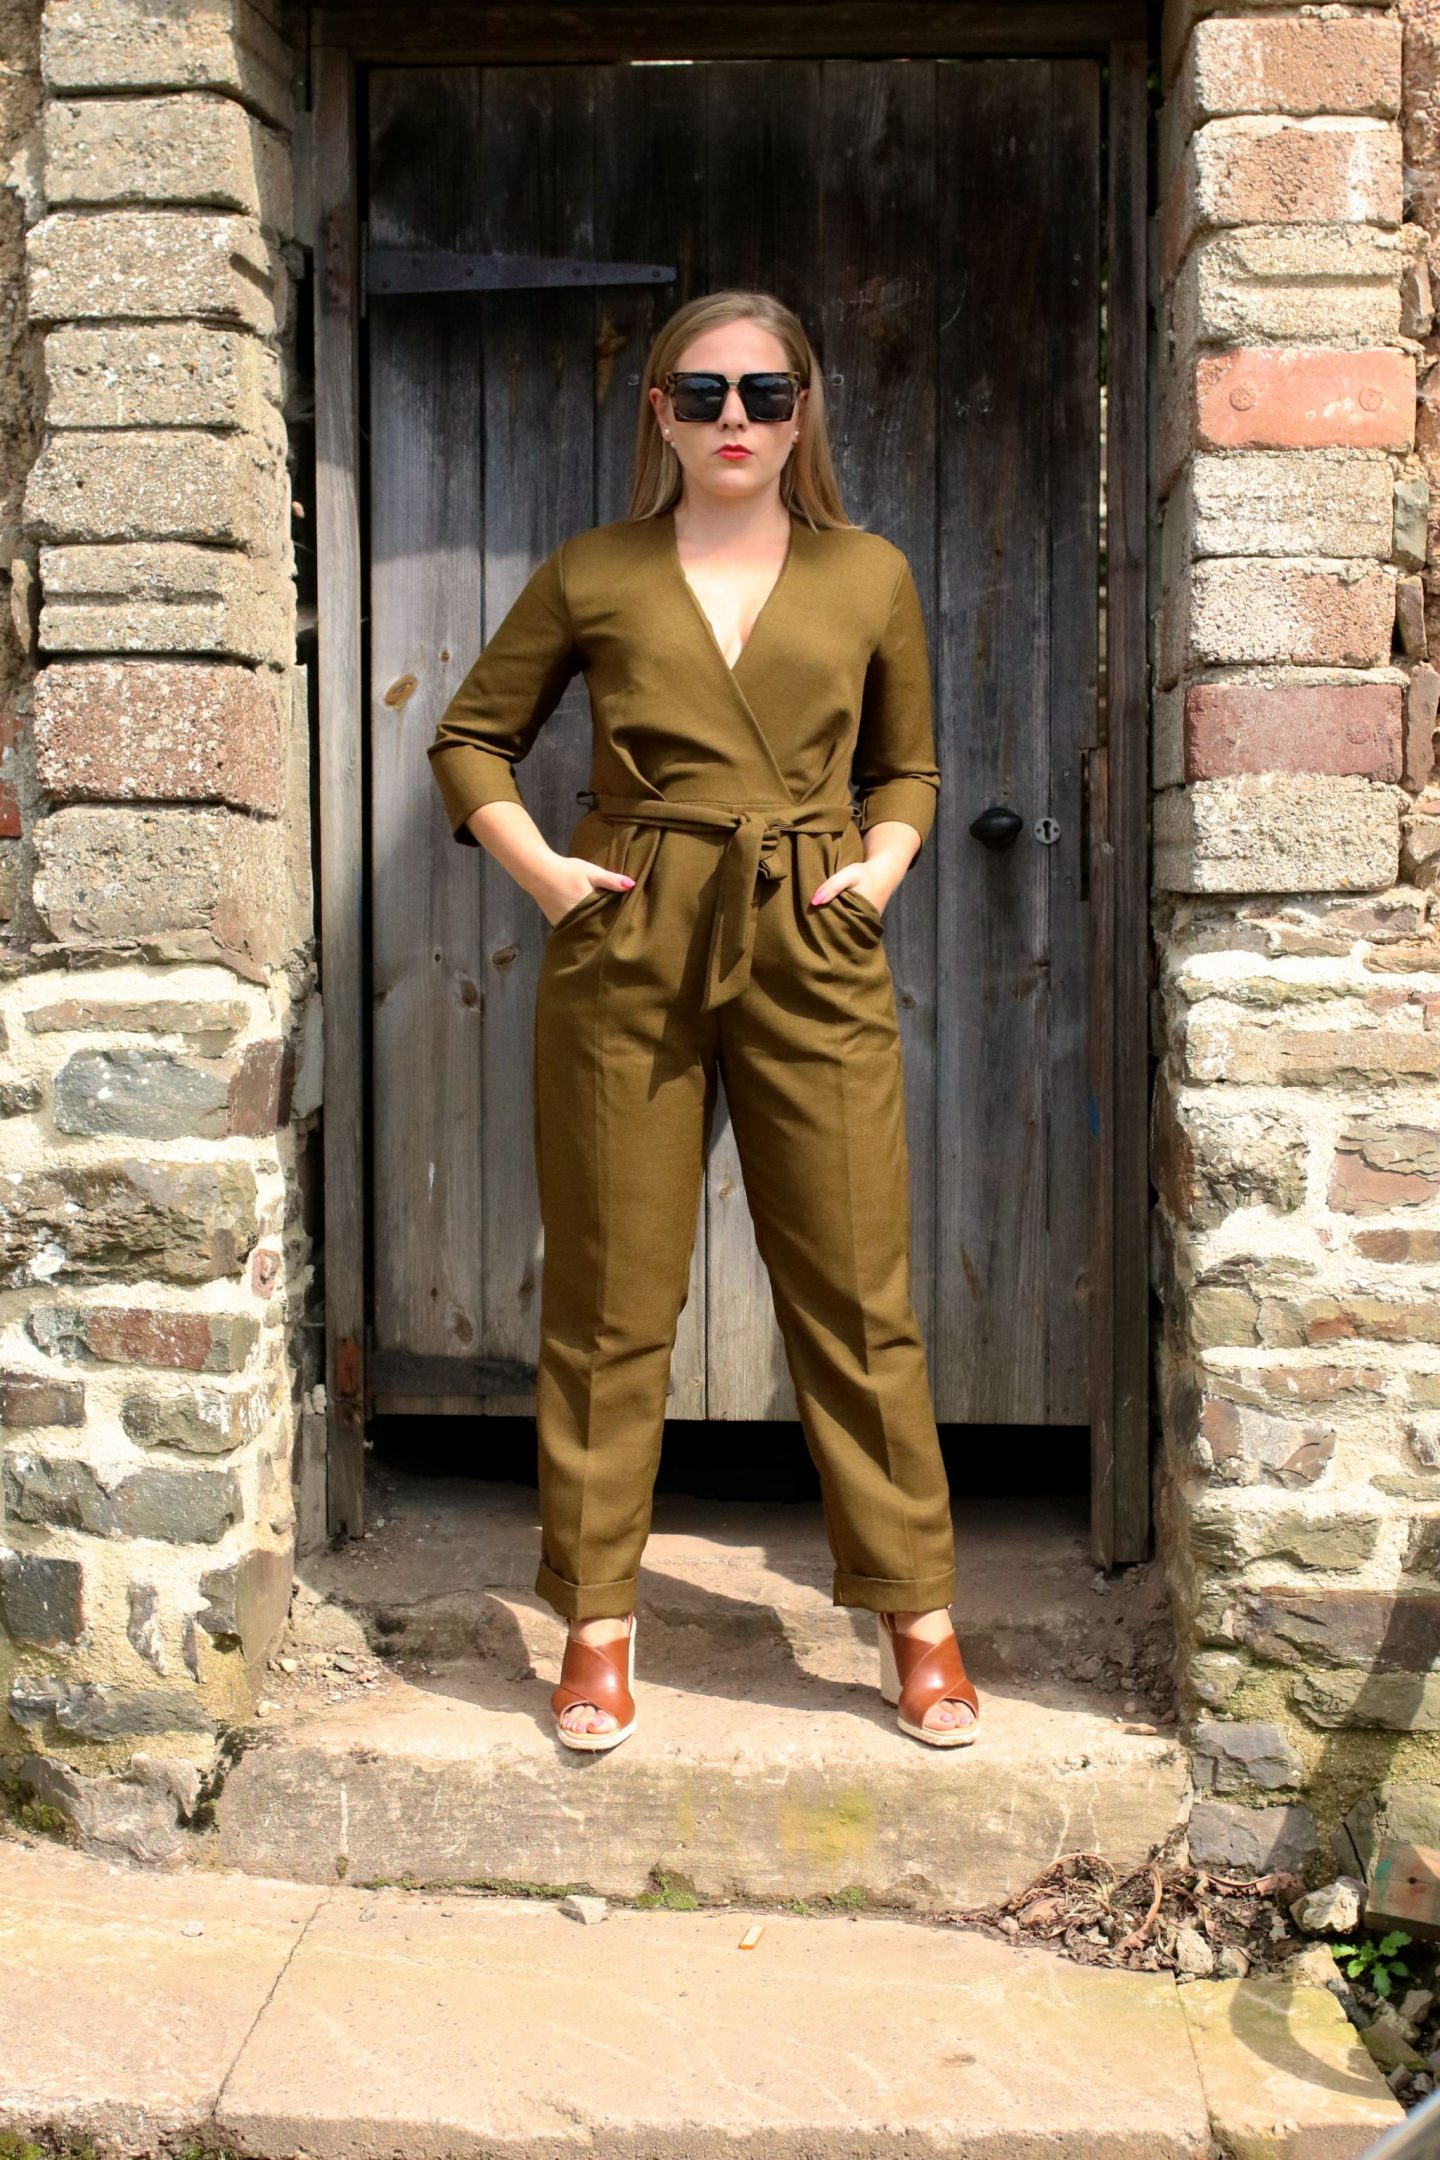 KATIE KALANCHOE wearing Closet London Jumpsuit in Khaki